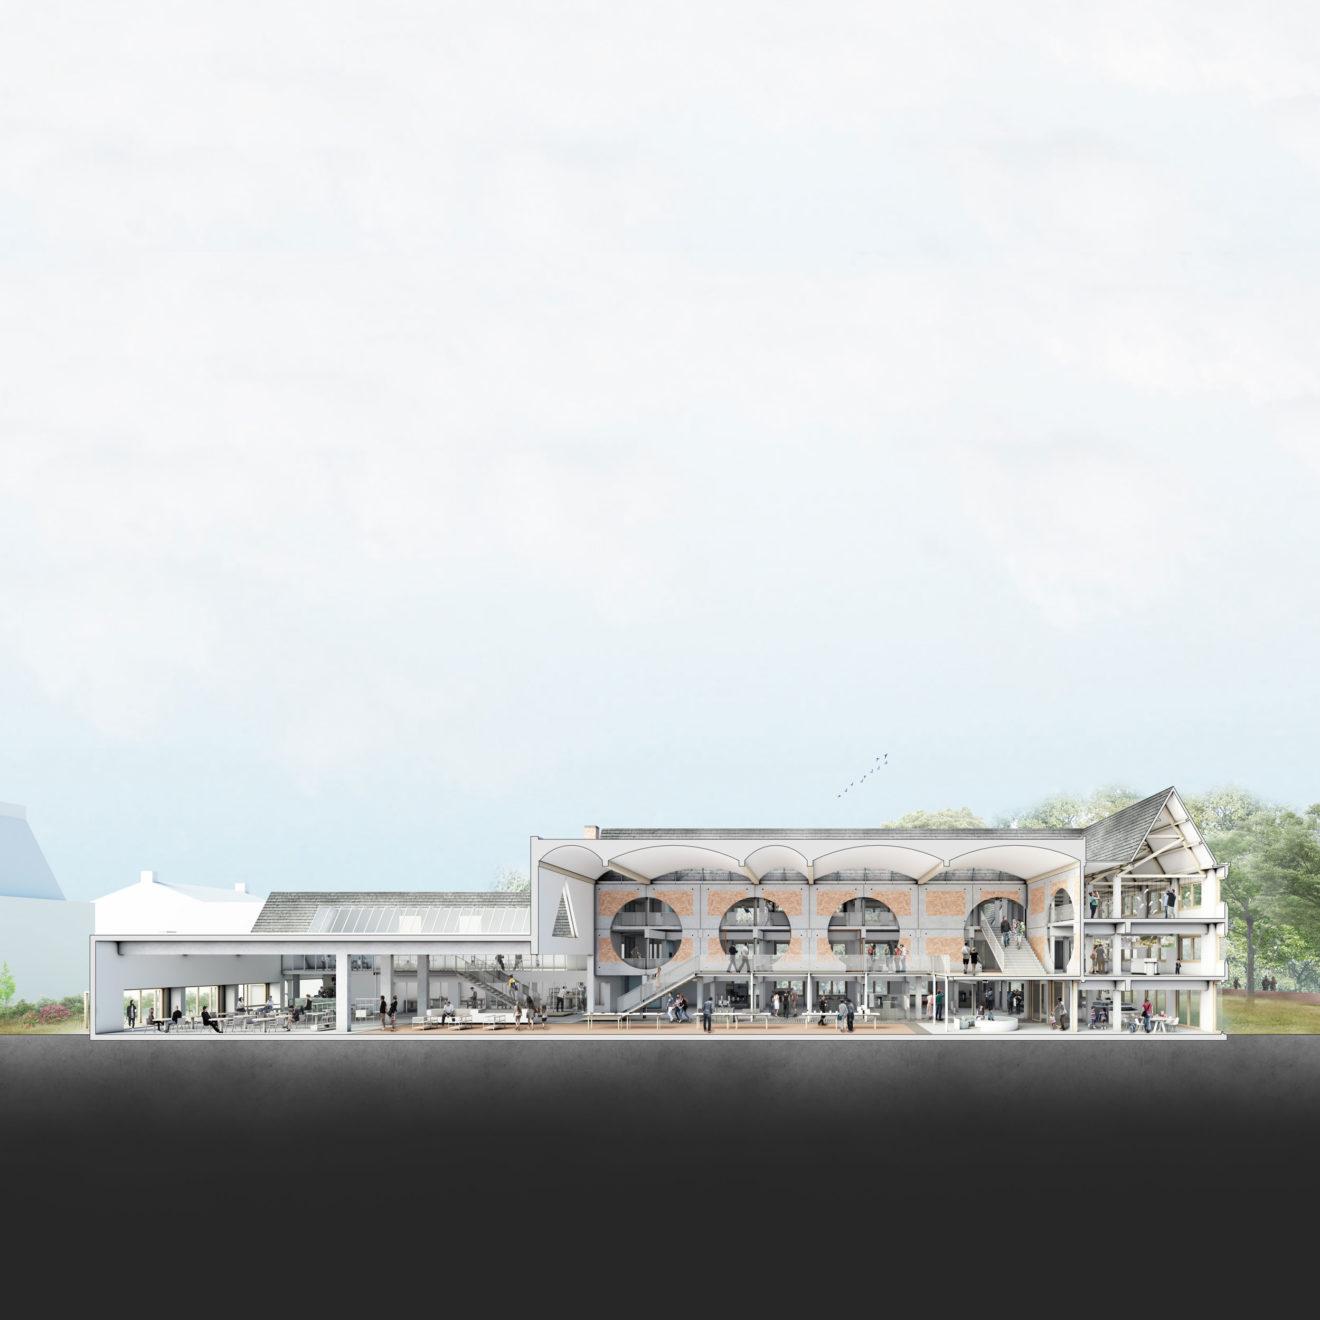 03-Civic-Architects-Schoenenmuseum-Waalwijk-Interieur-Copyright-Civic-Architects-test